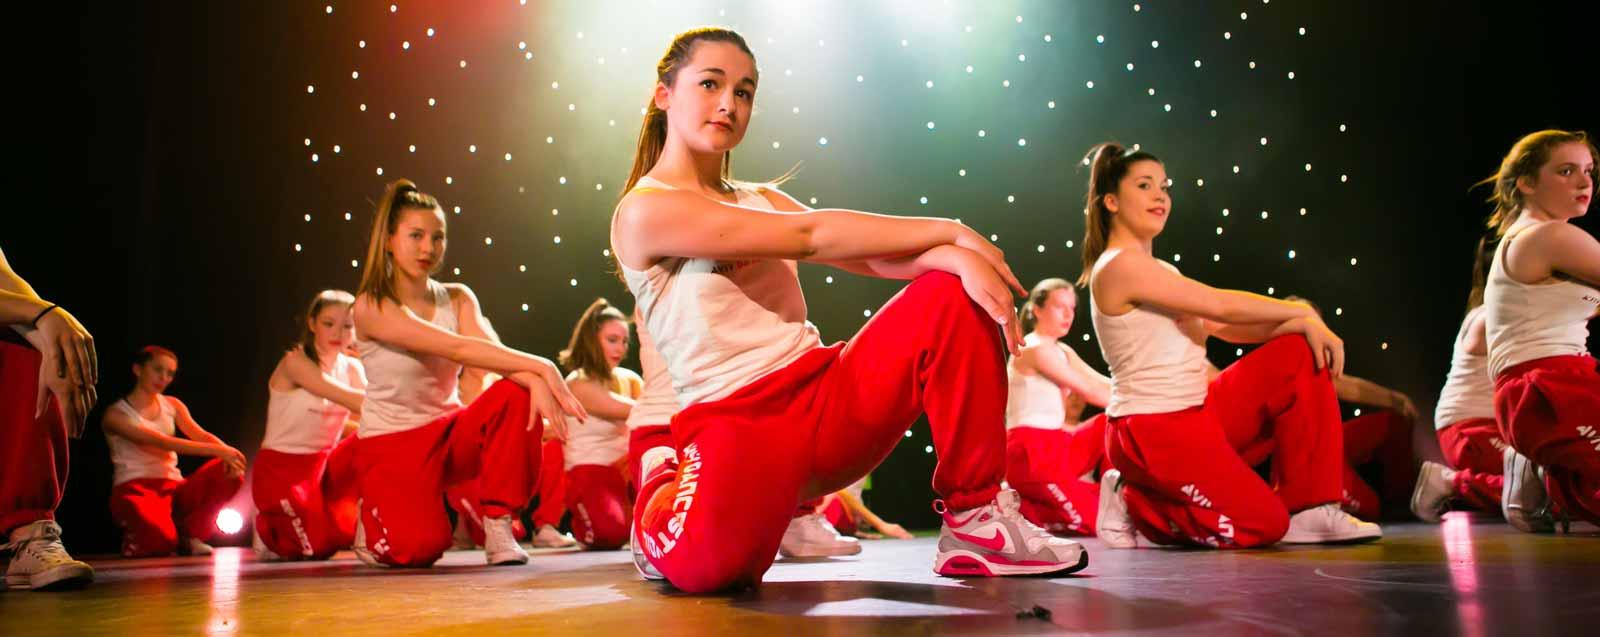 A dance performance at the Aviv Dance Studios' annual show